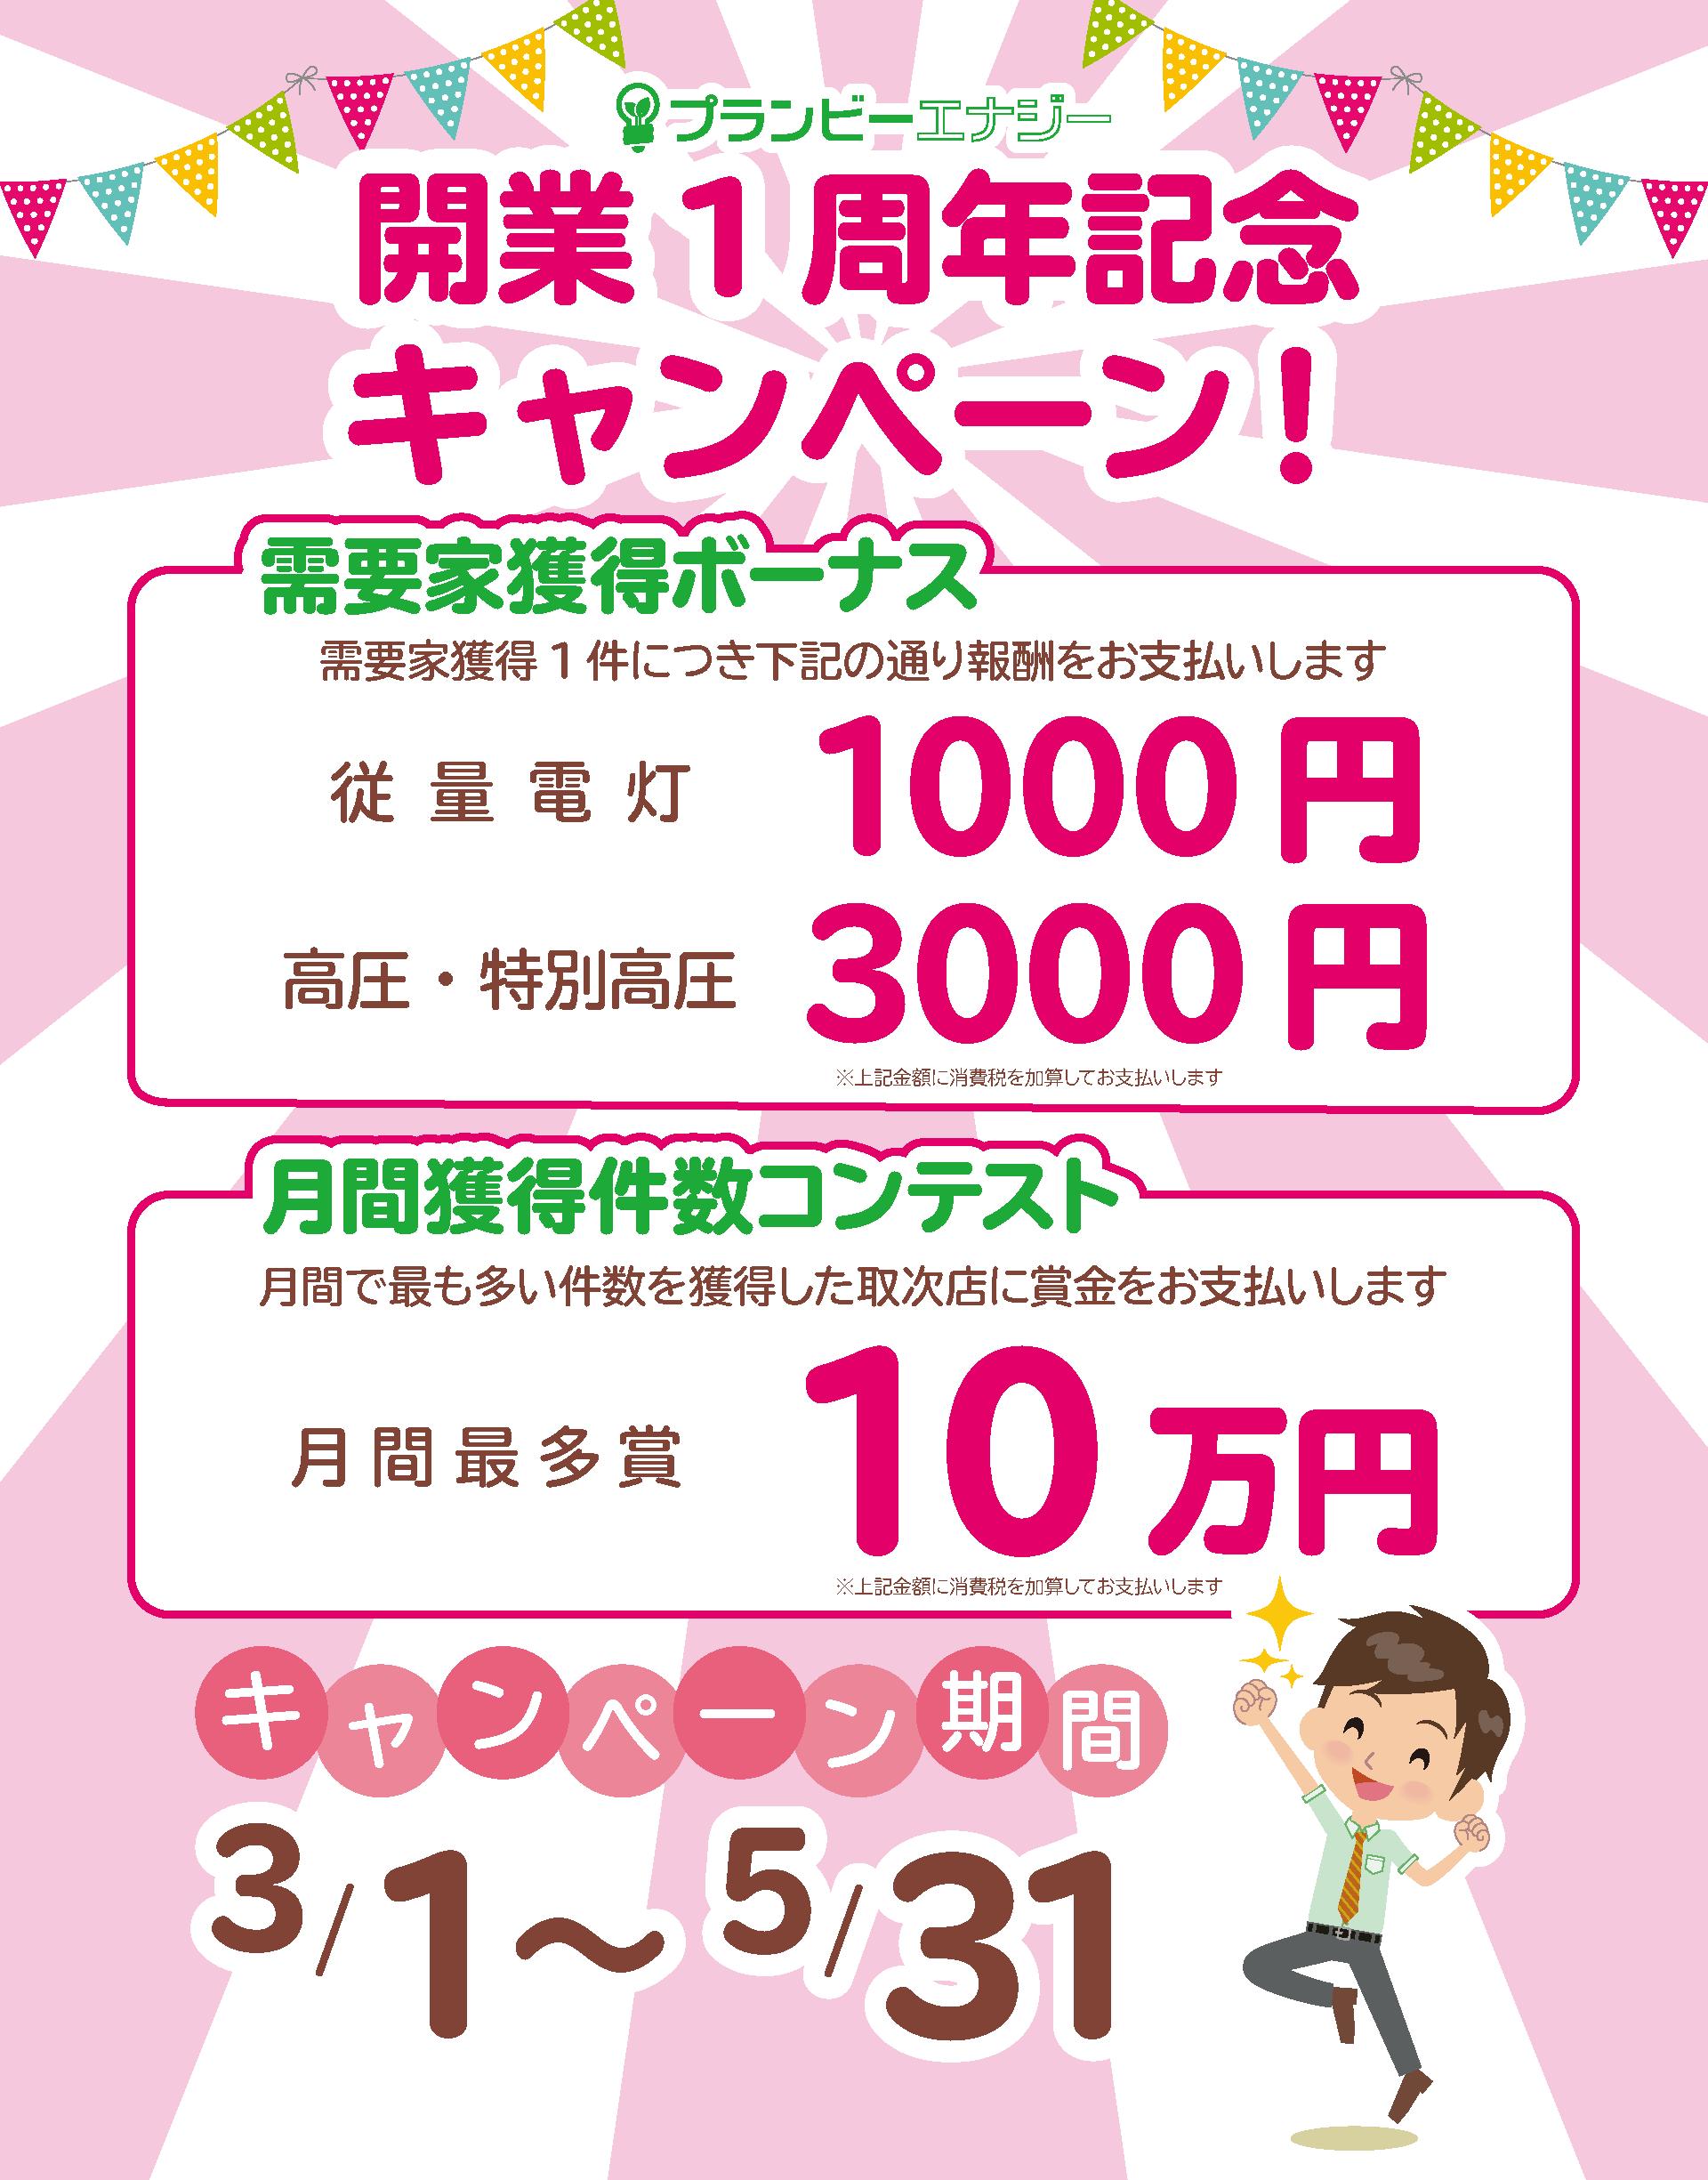 max-width: 100%; max-height: 100%;